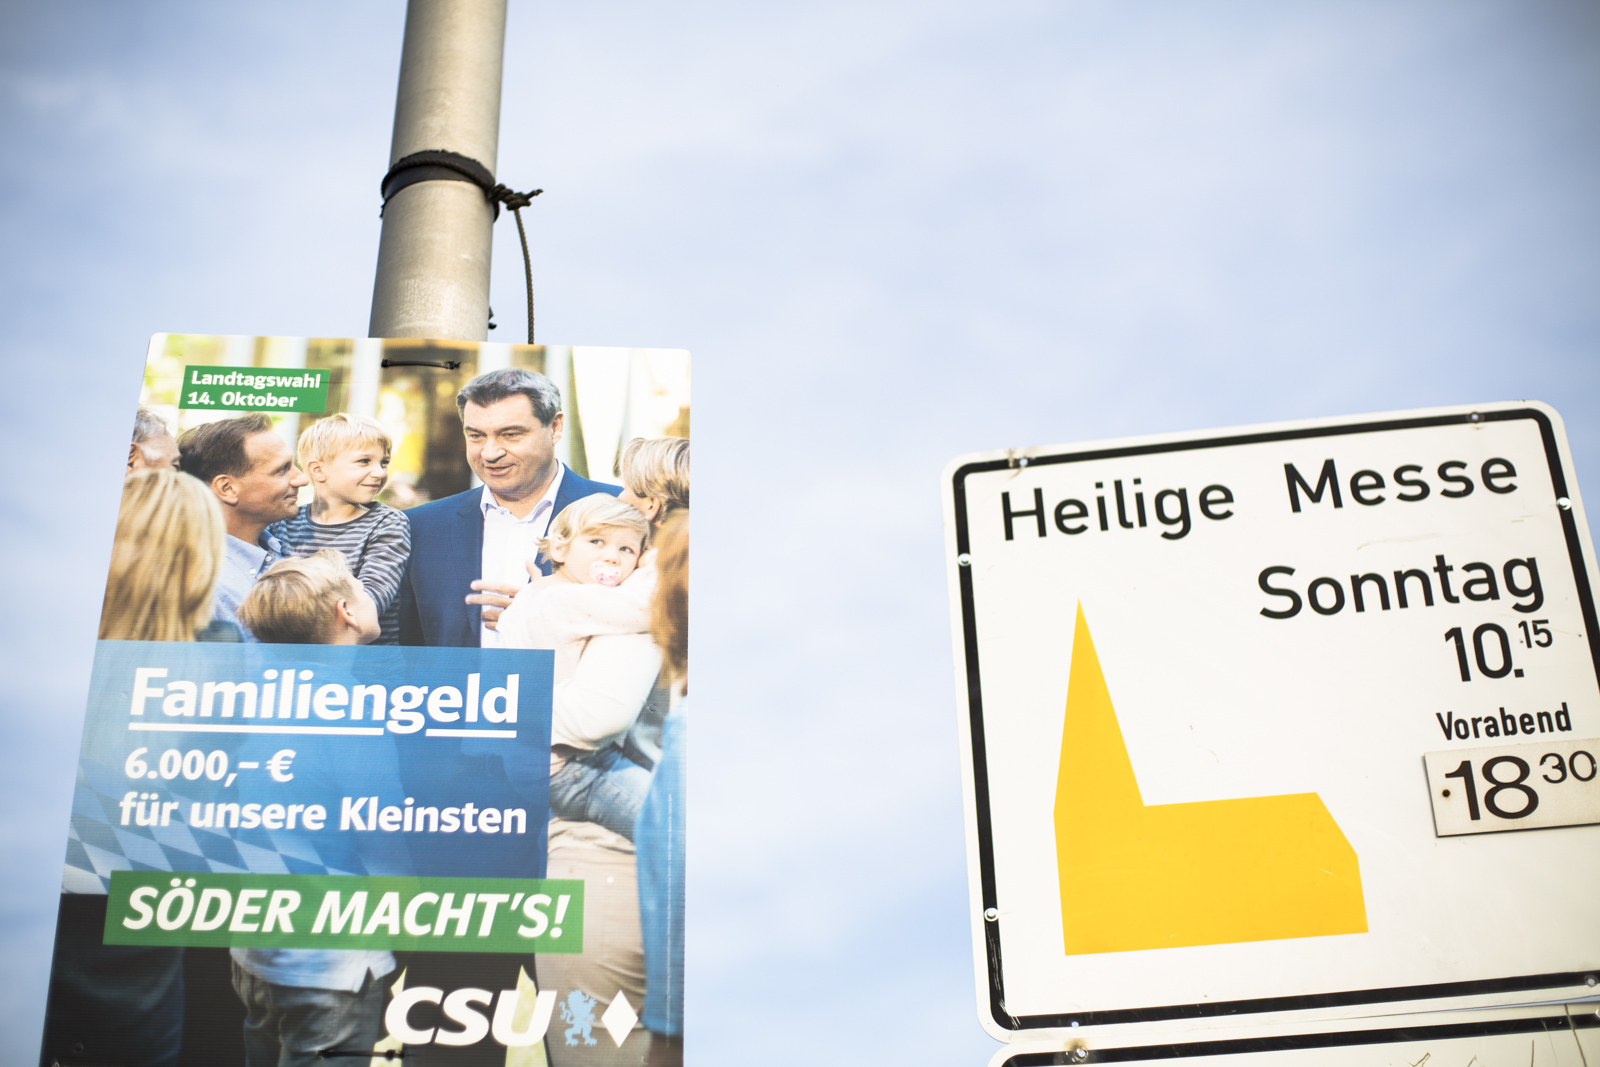 CSU Markus Söder – Landtagswahl Bayern 2018